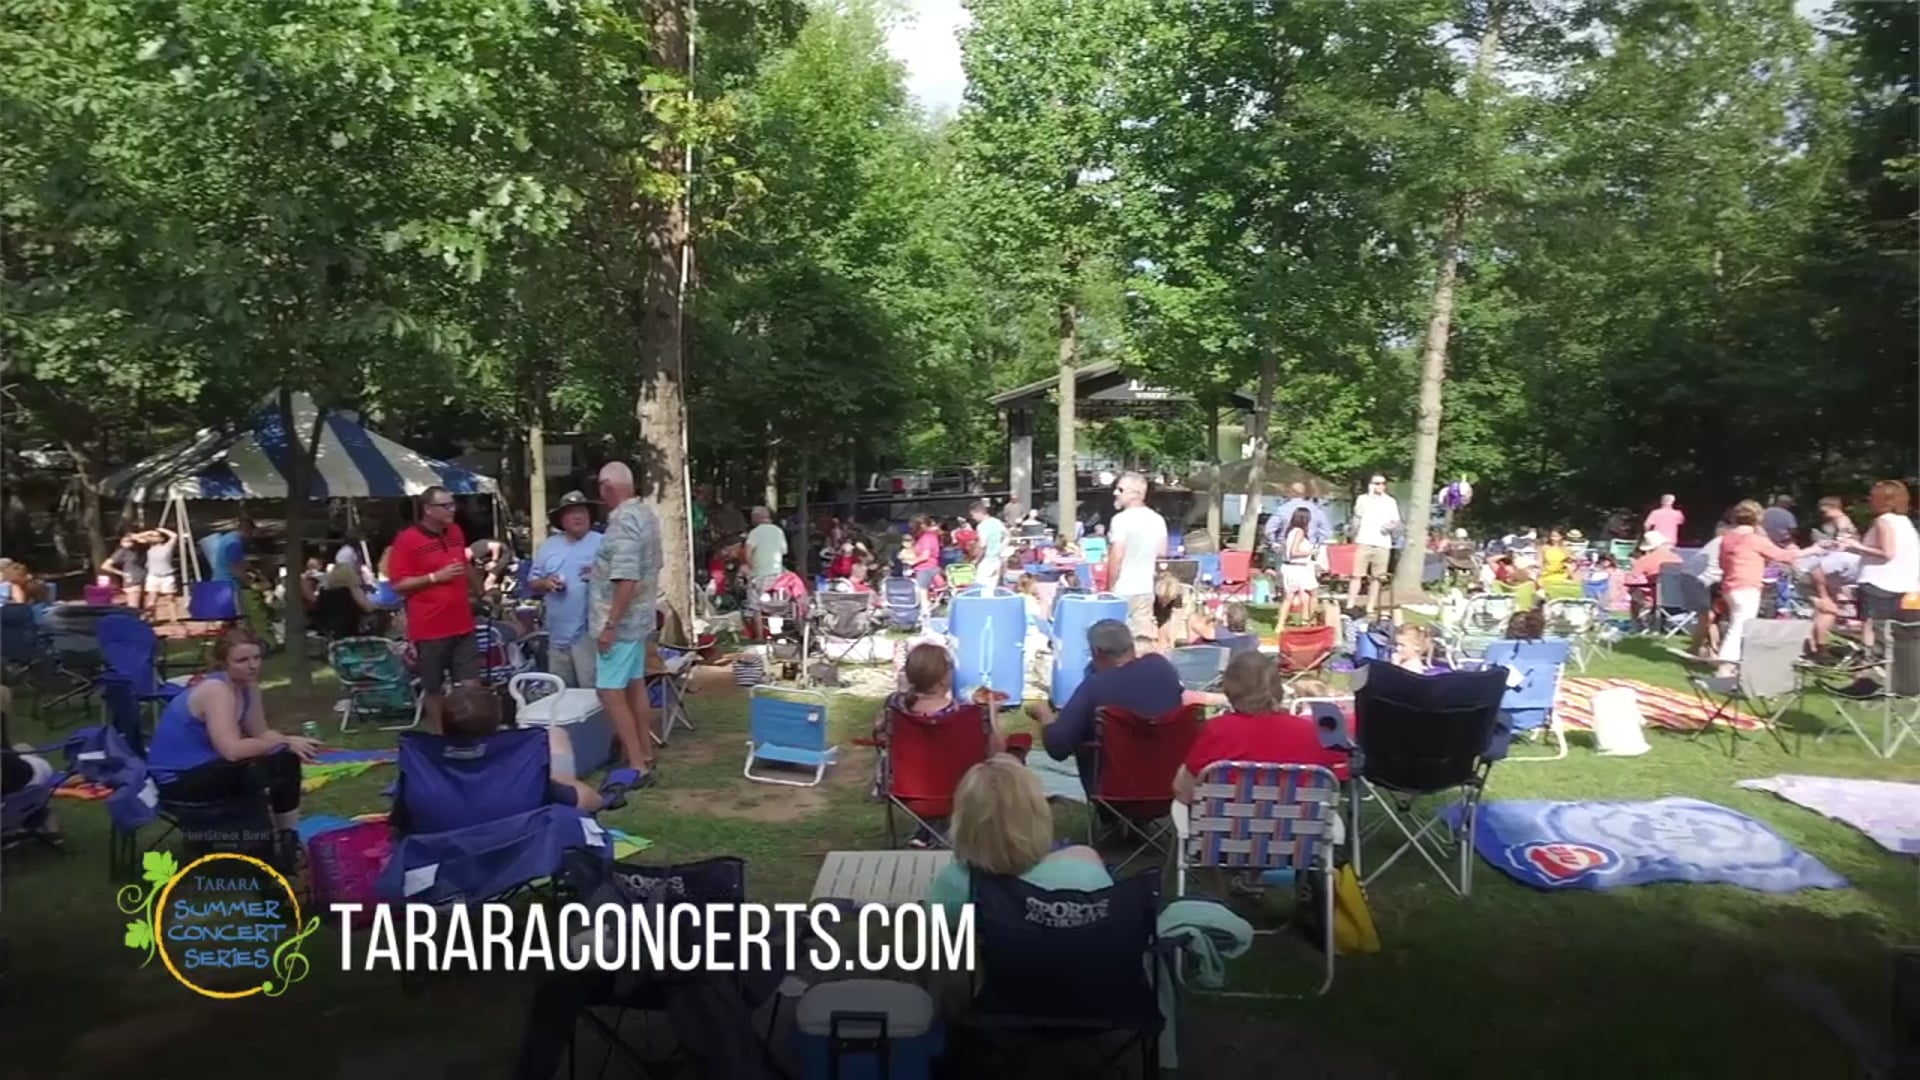 Tarara Summer Concert Series 2017 Highlights